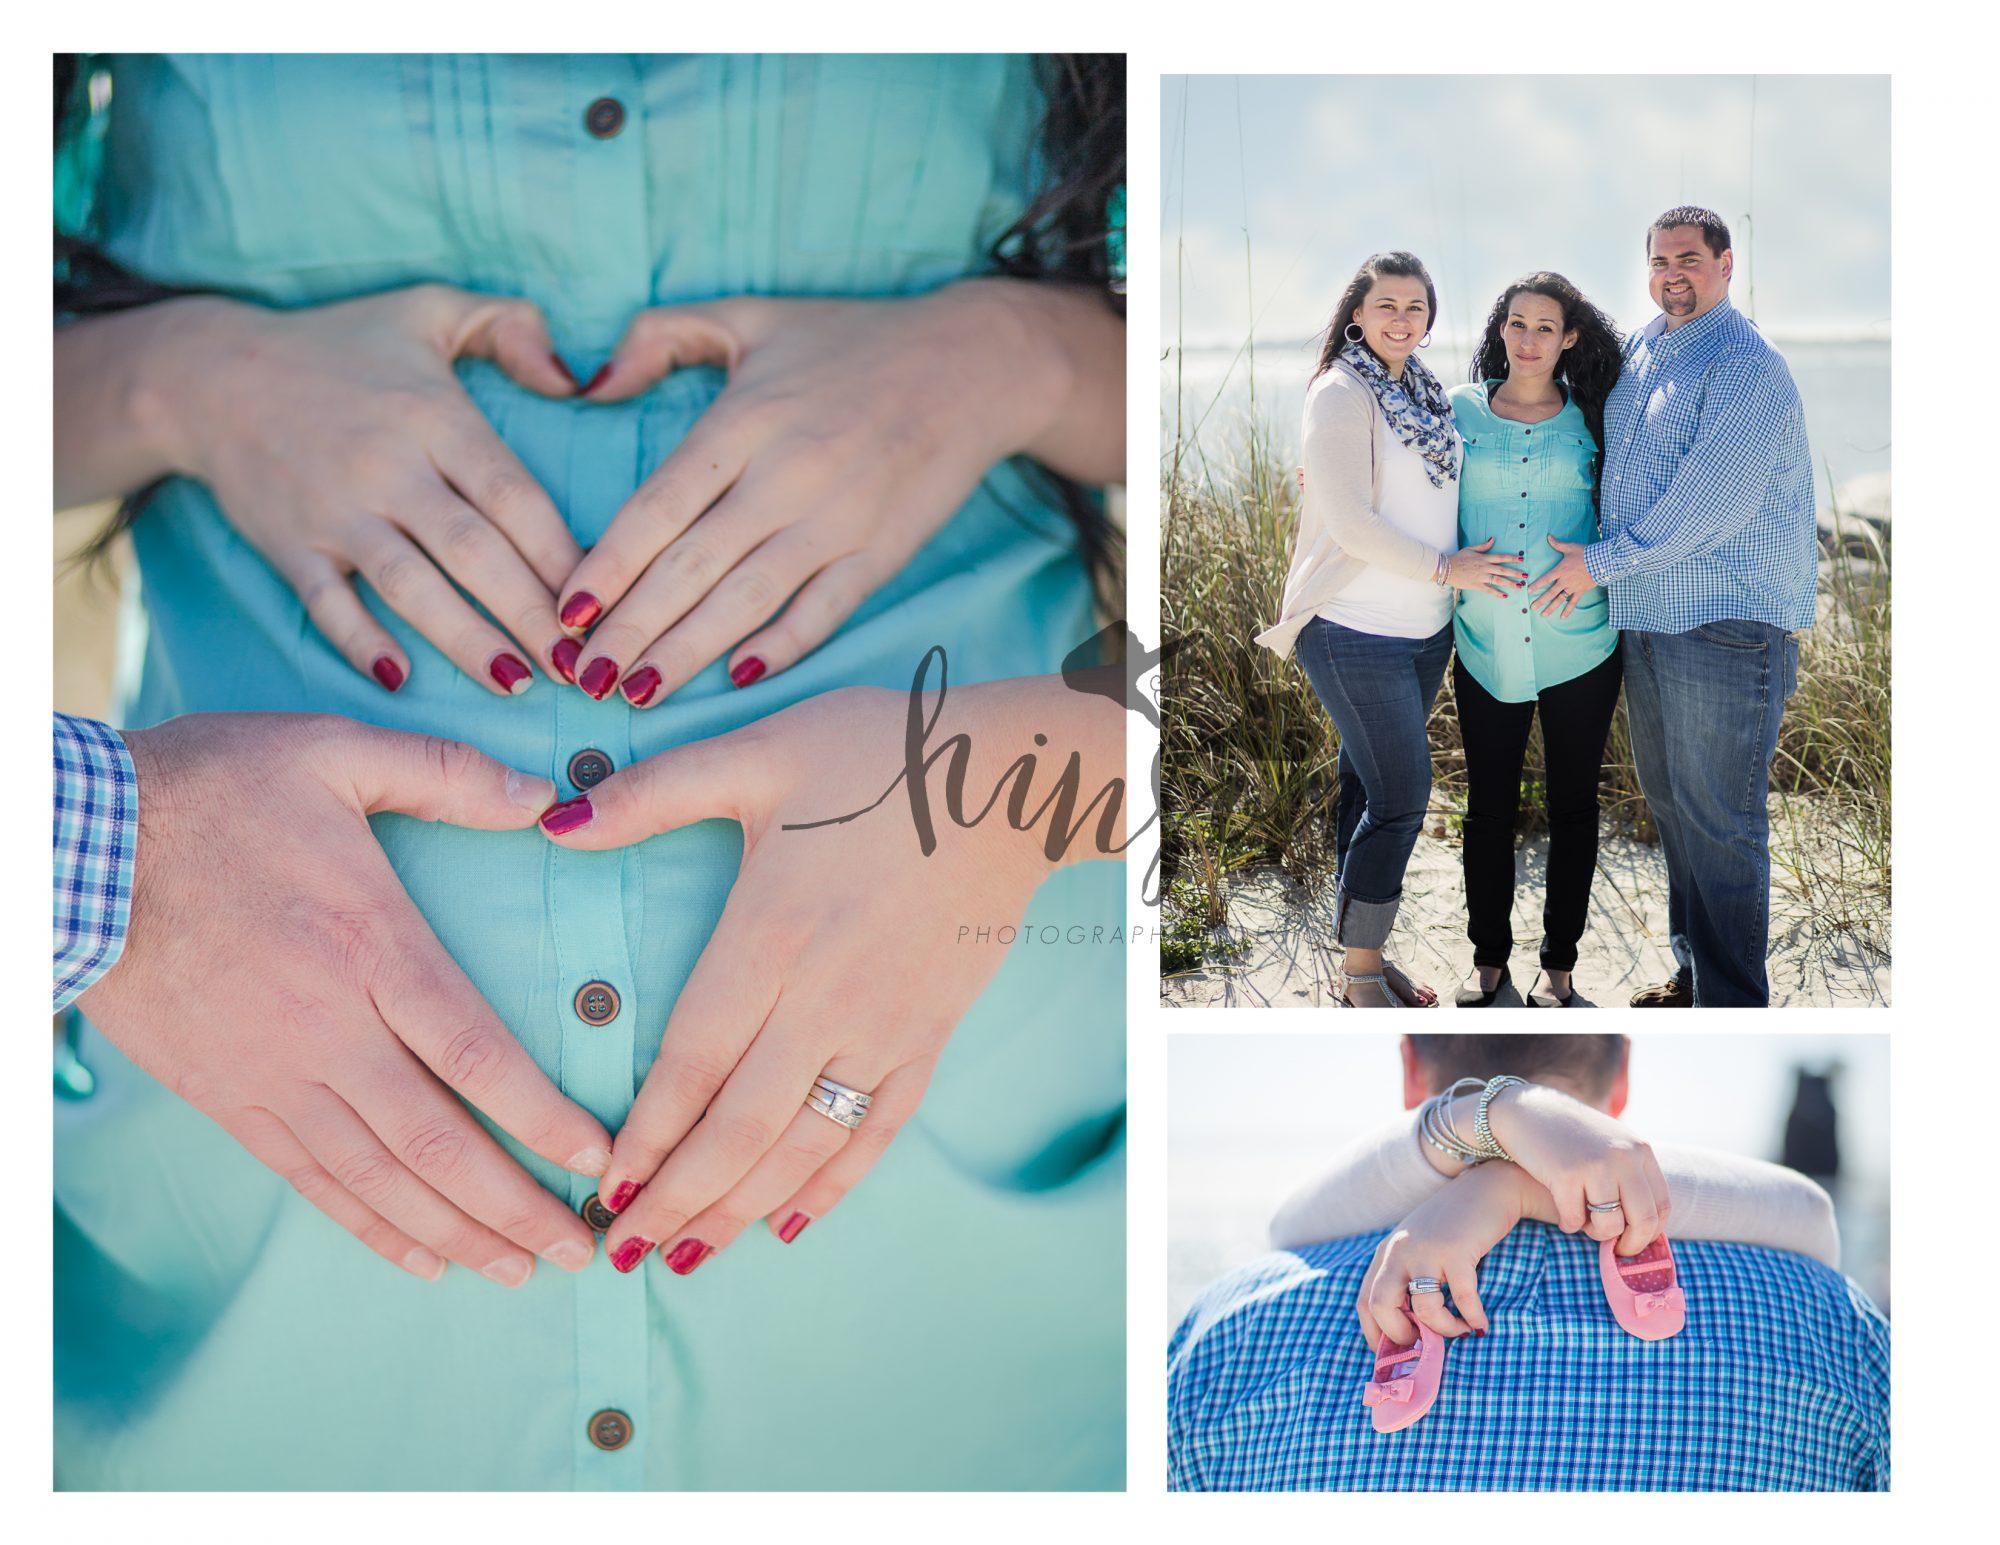 daytona beach photography family portrait session at lighthouse point park in daytona beach, FL adoption photography